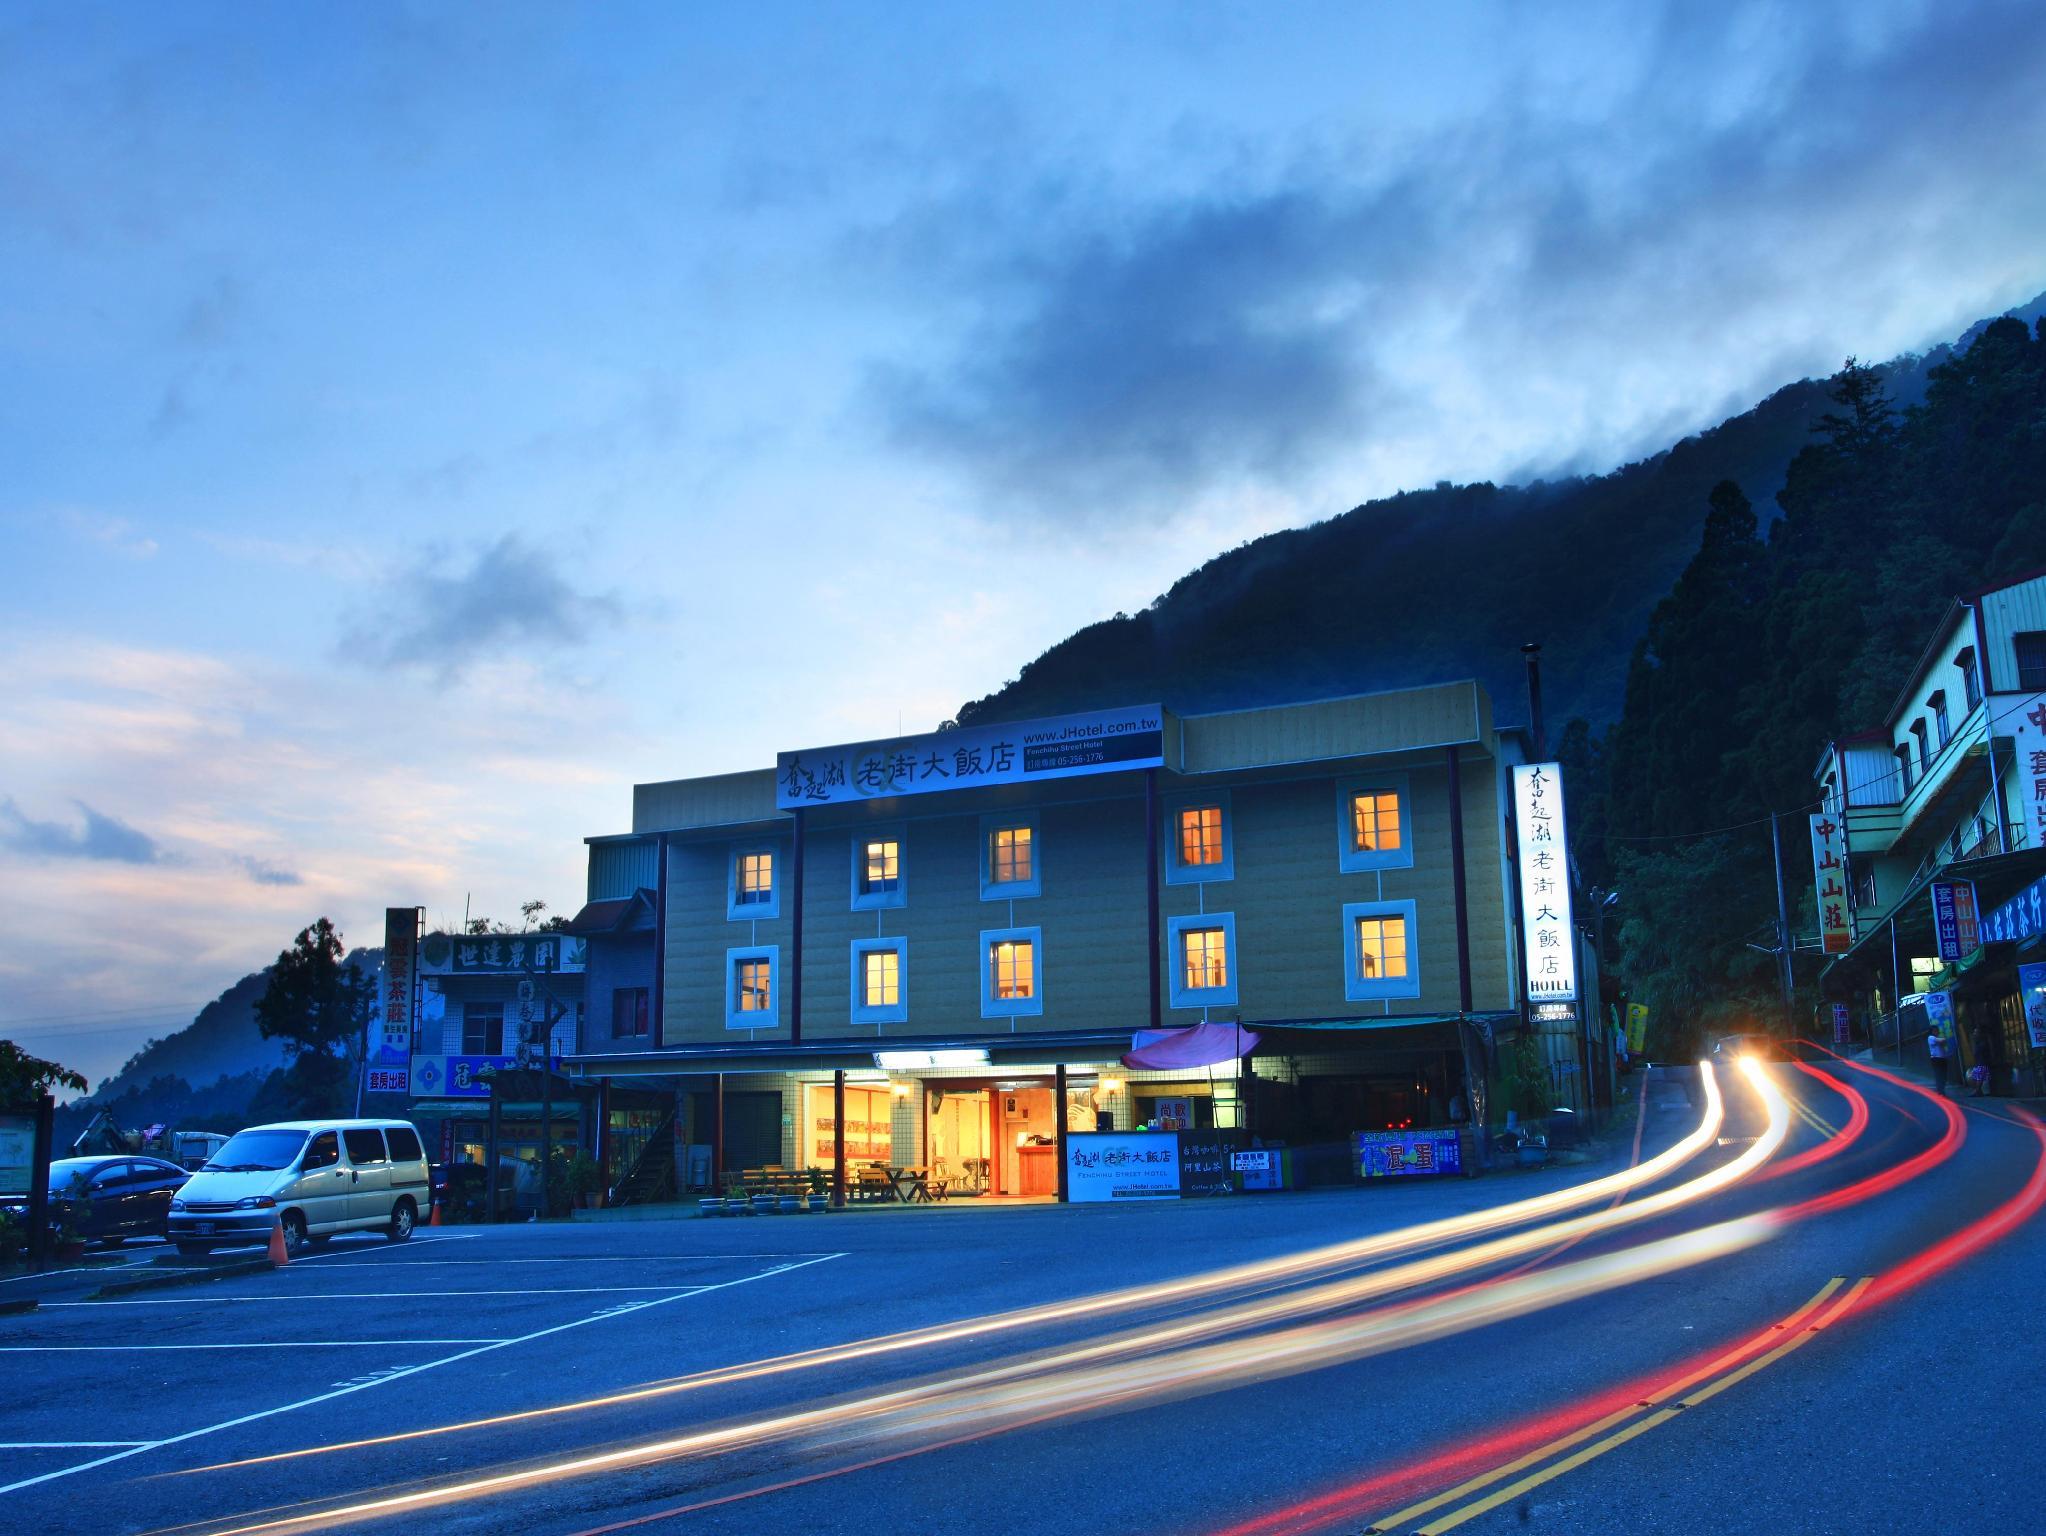 J Hotel Chiayi Taiwan Great Discounted Rates